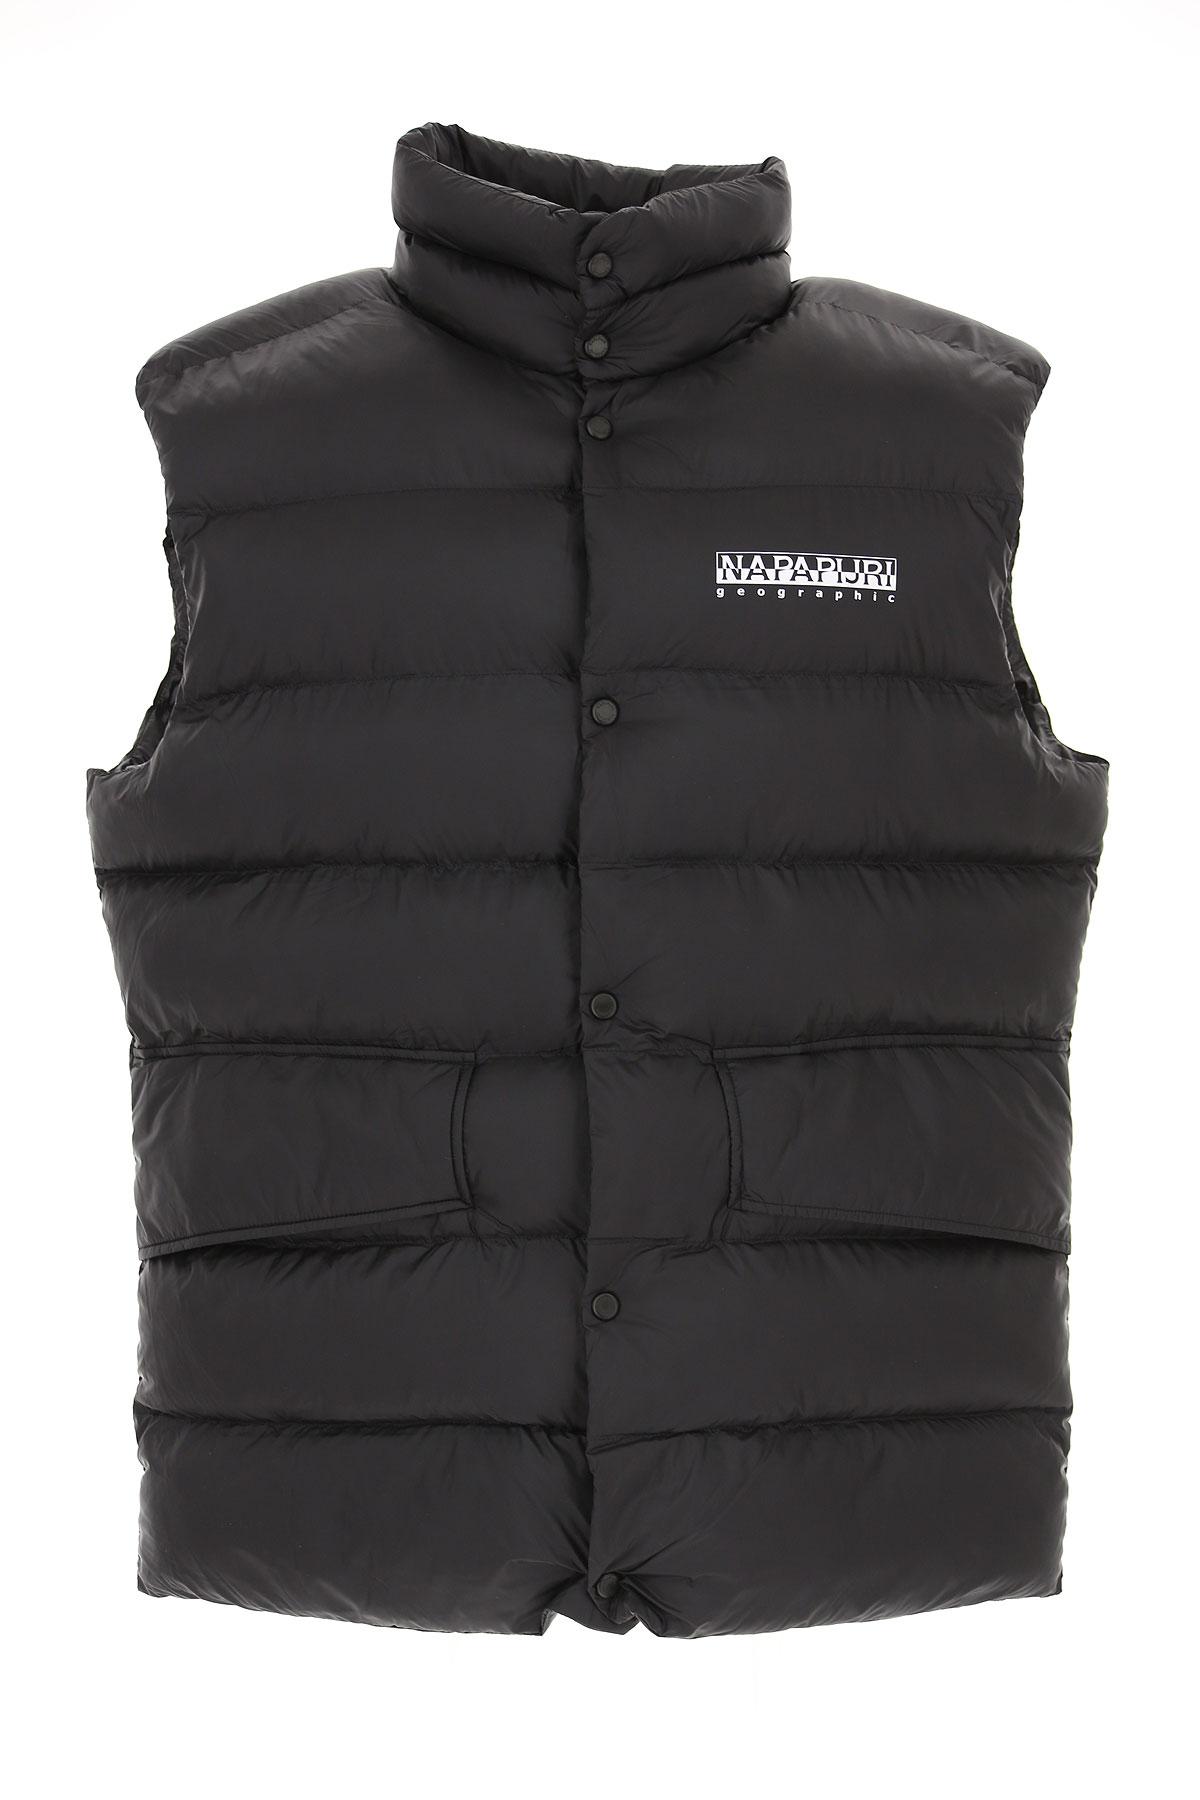 Image of Napapijri Down Jacket for Men, Puffer Ski Jacket, Black, polyamide, 2017, L M S XL